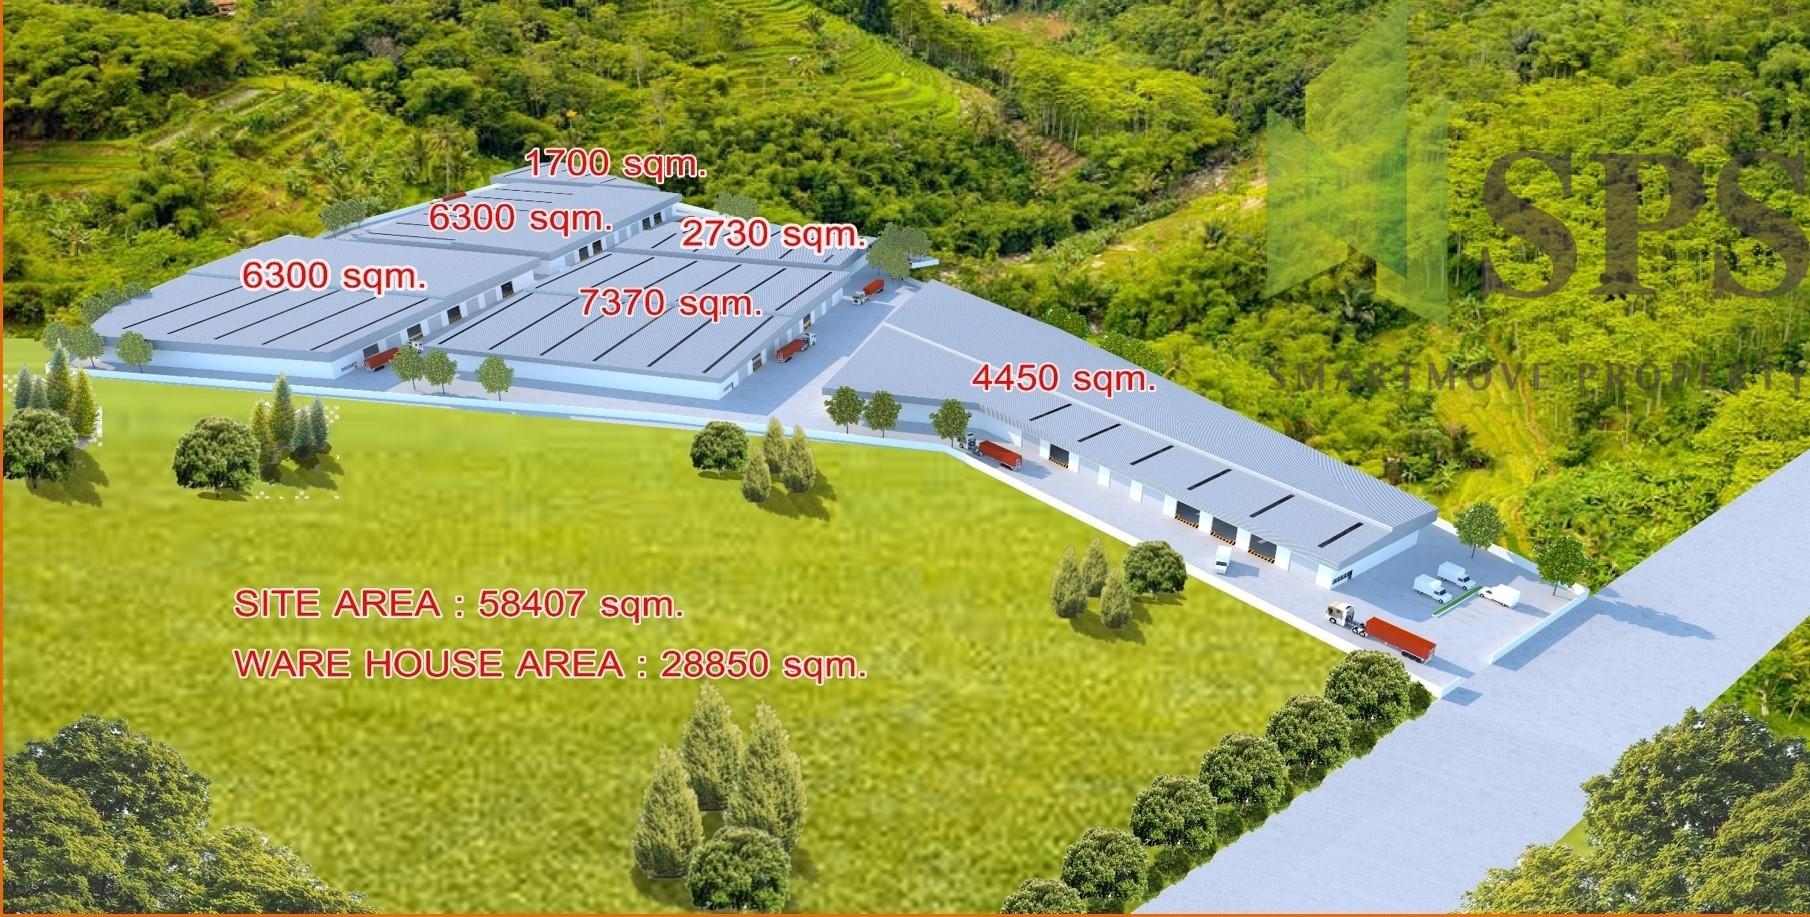 FOR RENT Warehouse at Siracha Chonburi สร้างโรงงาน/โกดัง/คลังสินค้า ศรีราชา มุ่งเน้นความพึงพอใจของลูกค้า (SPSCS086)